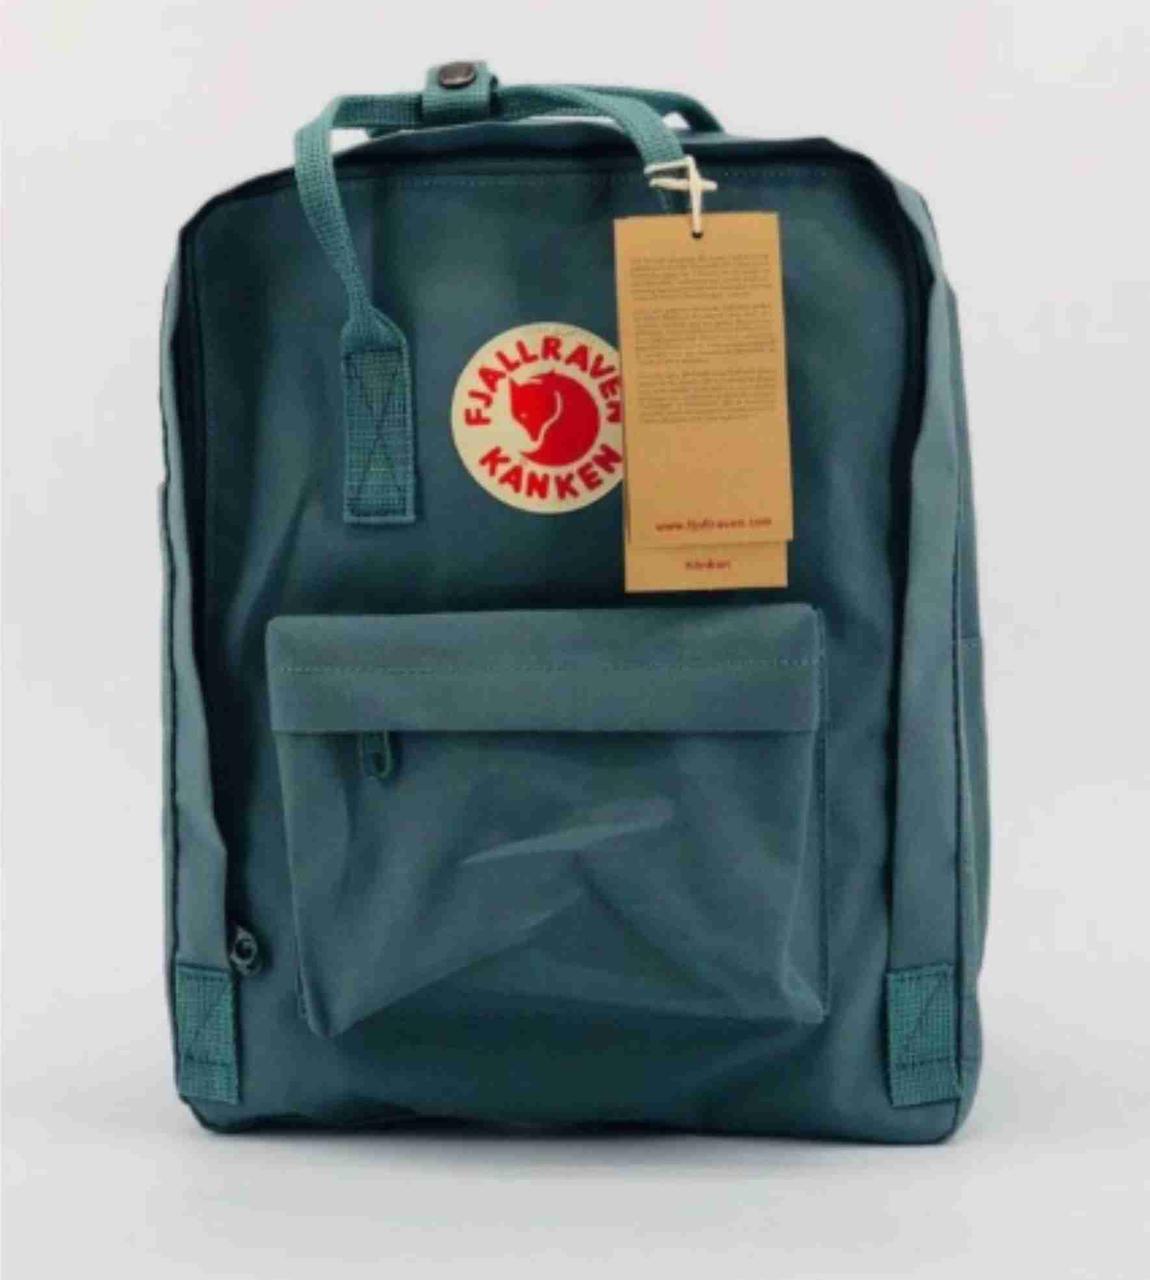 Рюкзак Fjallraven Kanken Classic. Вместительный рюкзак. Рюкзаки Канкен. Рюкзак Шведский Канкен. Бирюза